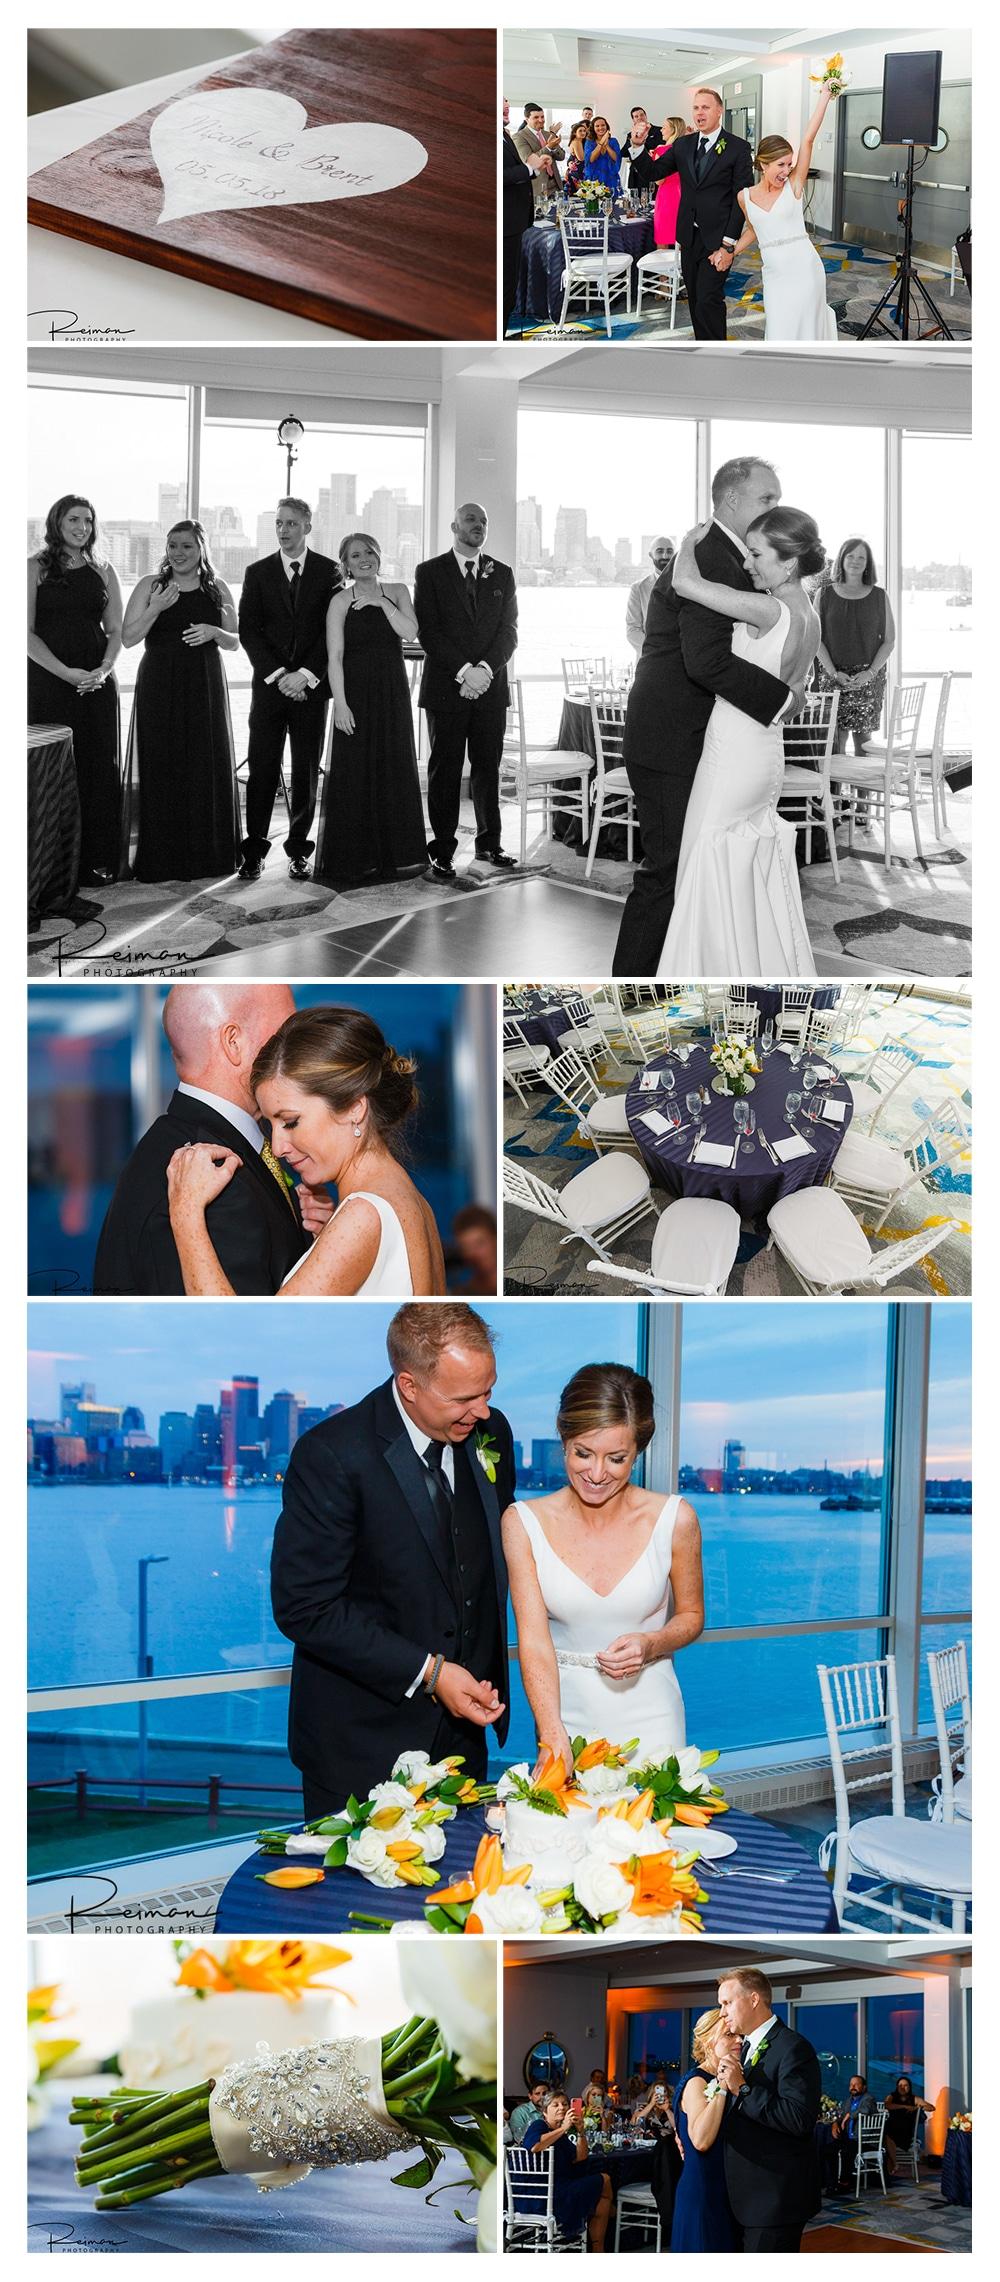 Hyatt Regency Boston Harbor Wedding, Boston Wedding Photographer, Reiman Photography, May, Spring